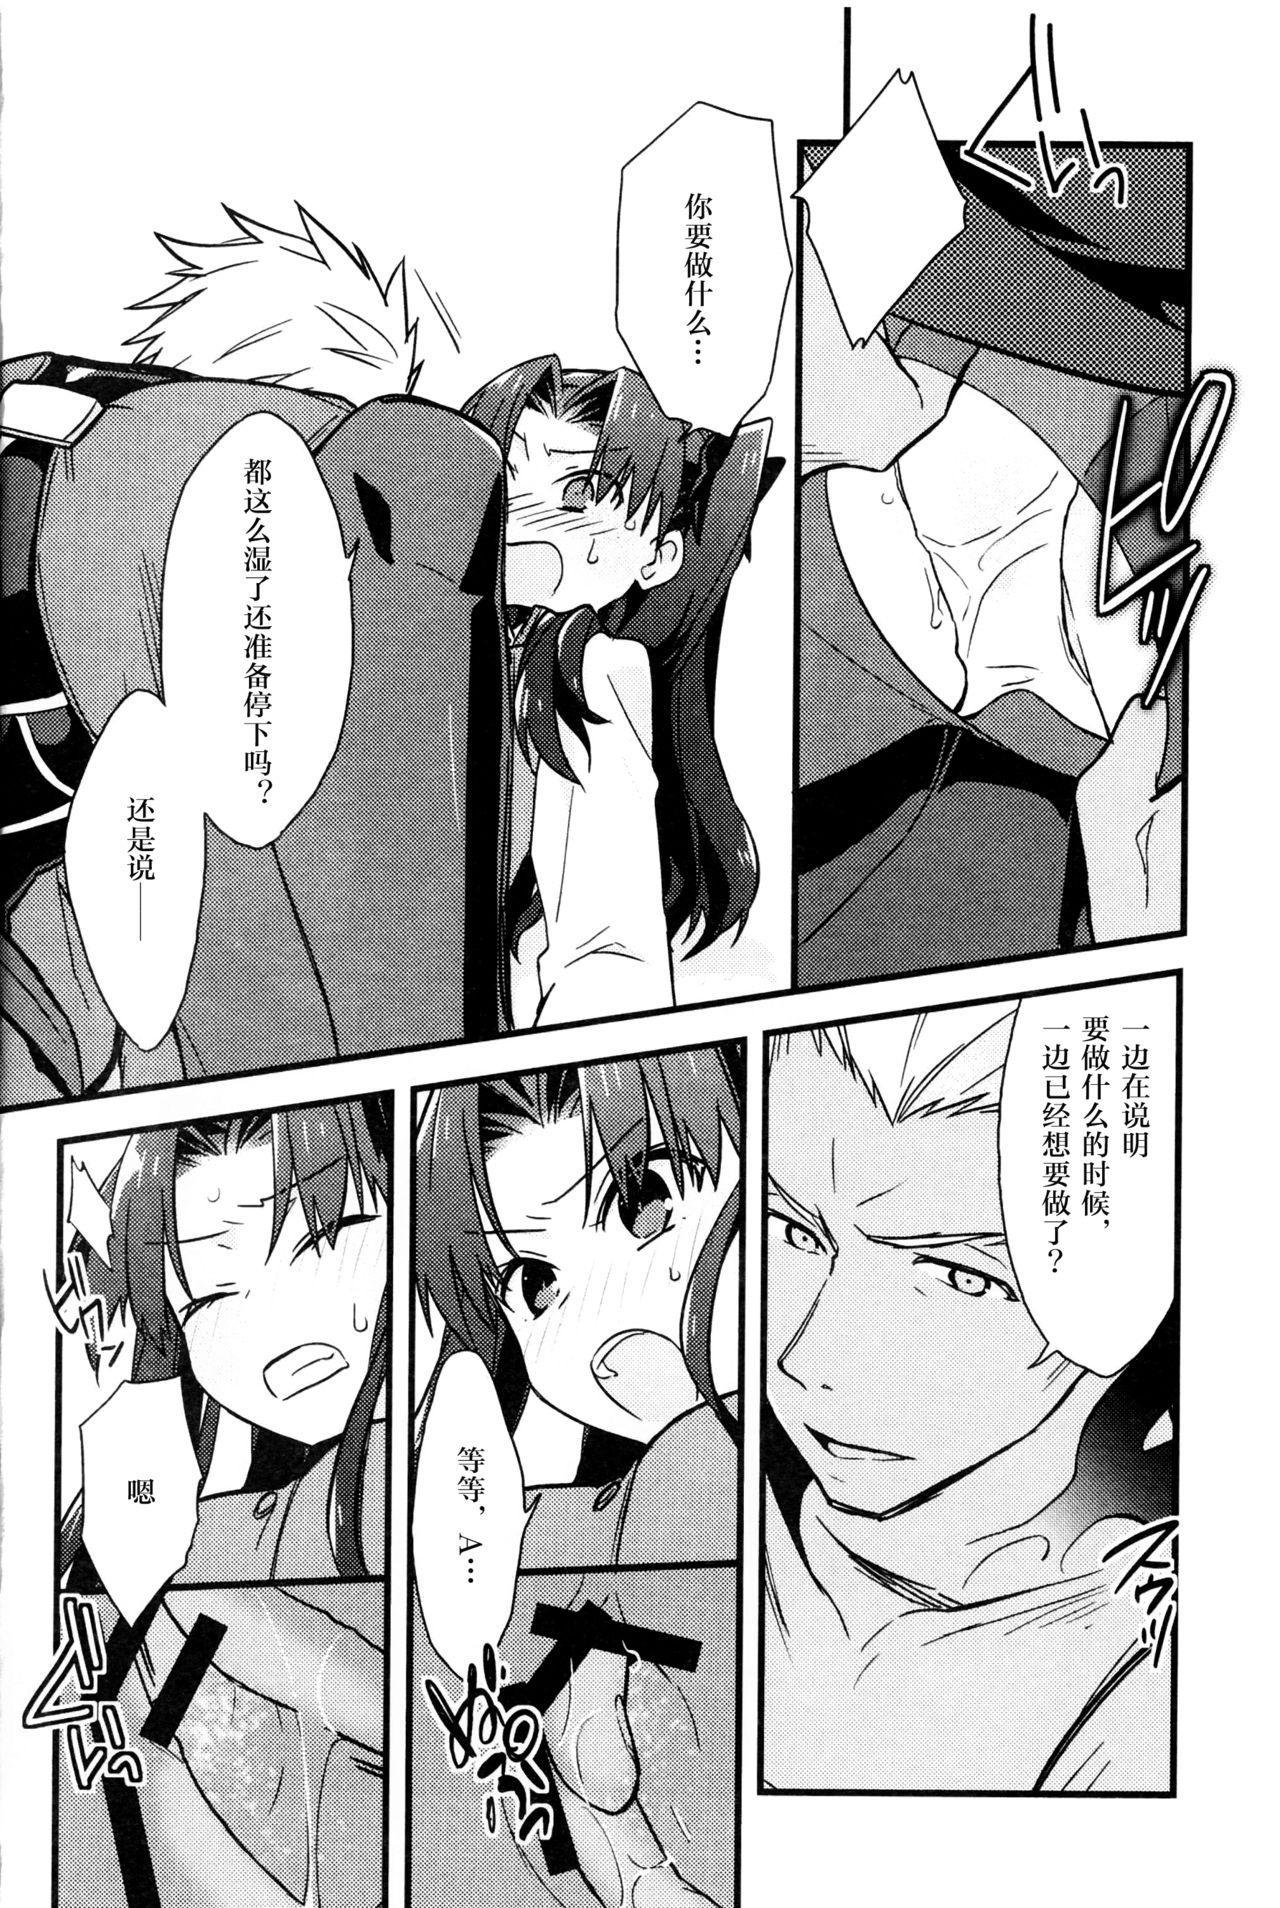 Masaka Ano Tosaka-san ga Jugyouchuu ni 10